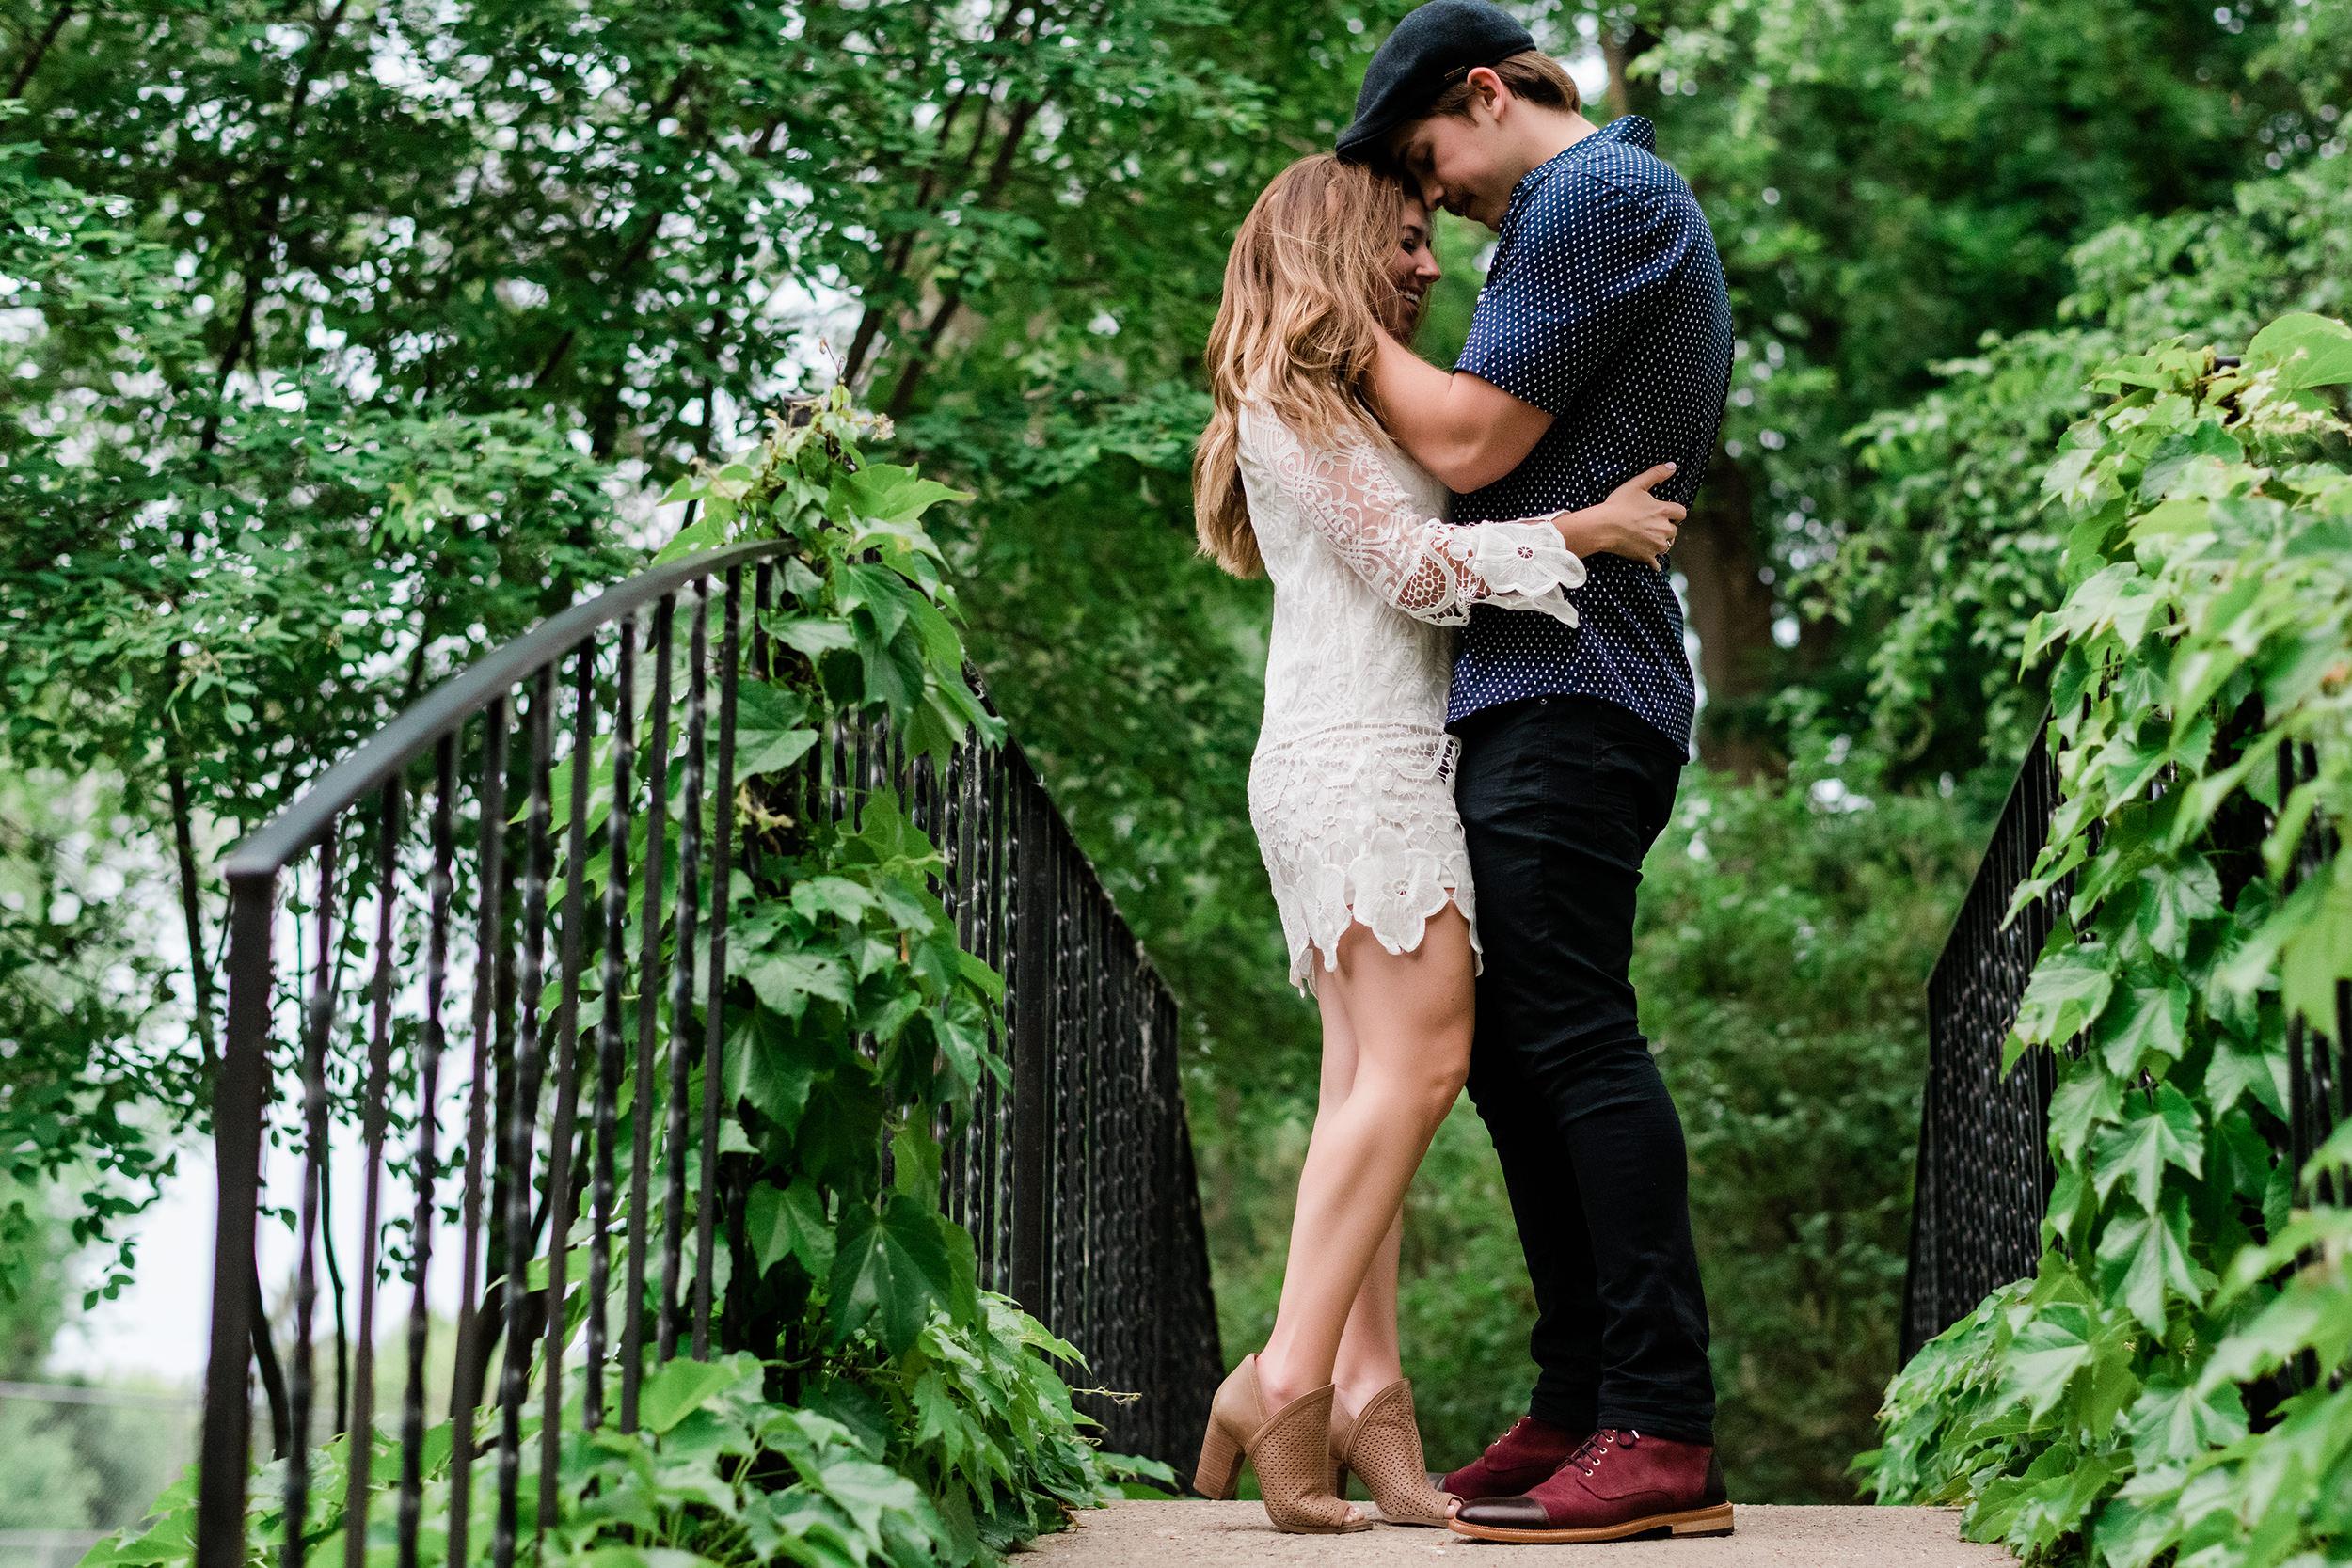 Man runs his fingers through his fiancé's hair as they stand on a bridge